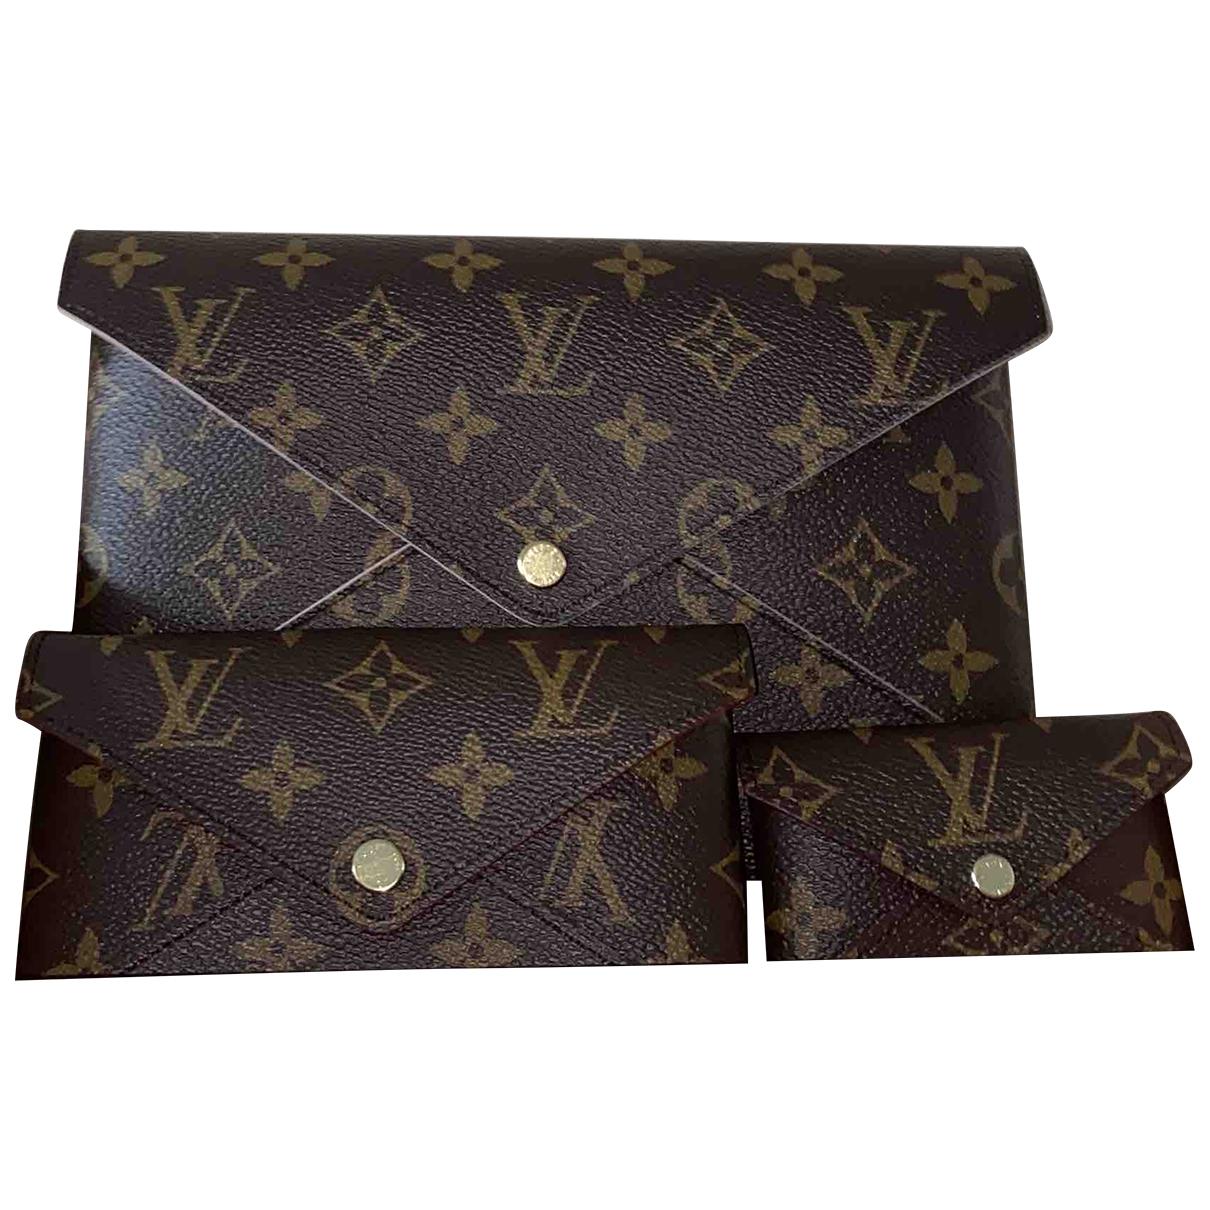 Louis Vuitton - Pochette Kirigami pour femme en toile - marron